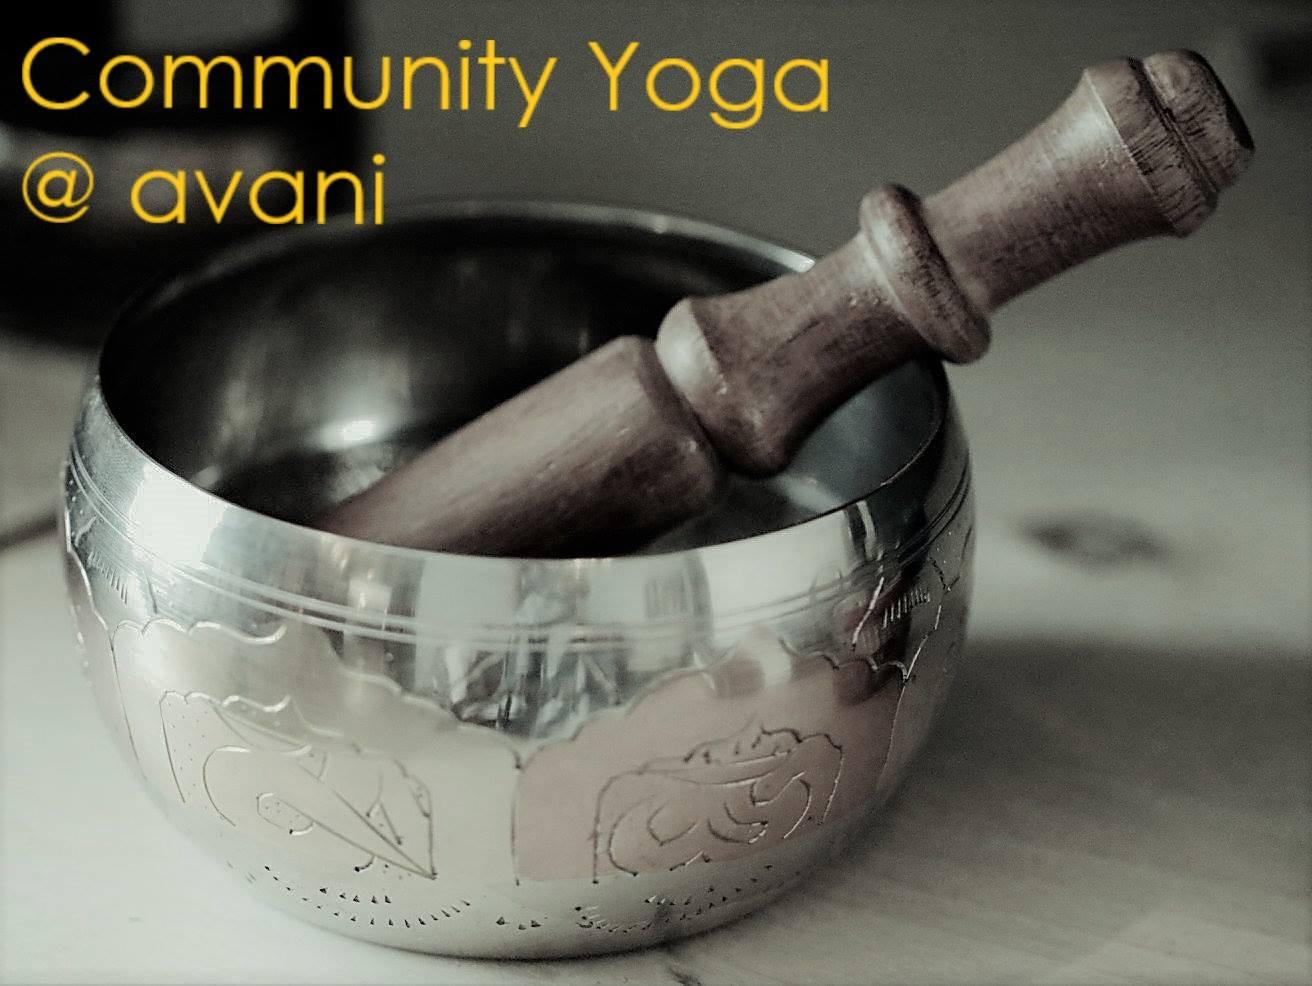 community_yoga_avani.jpg